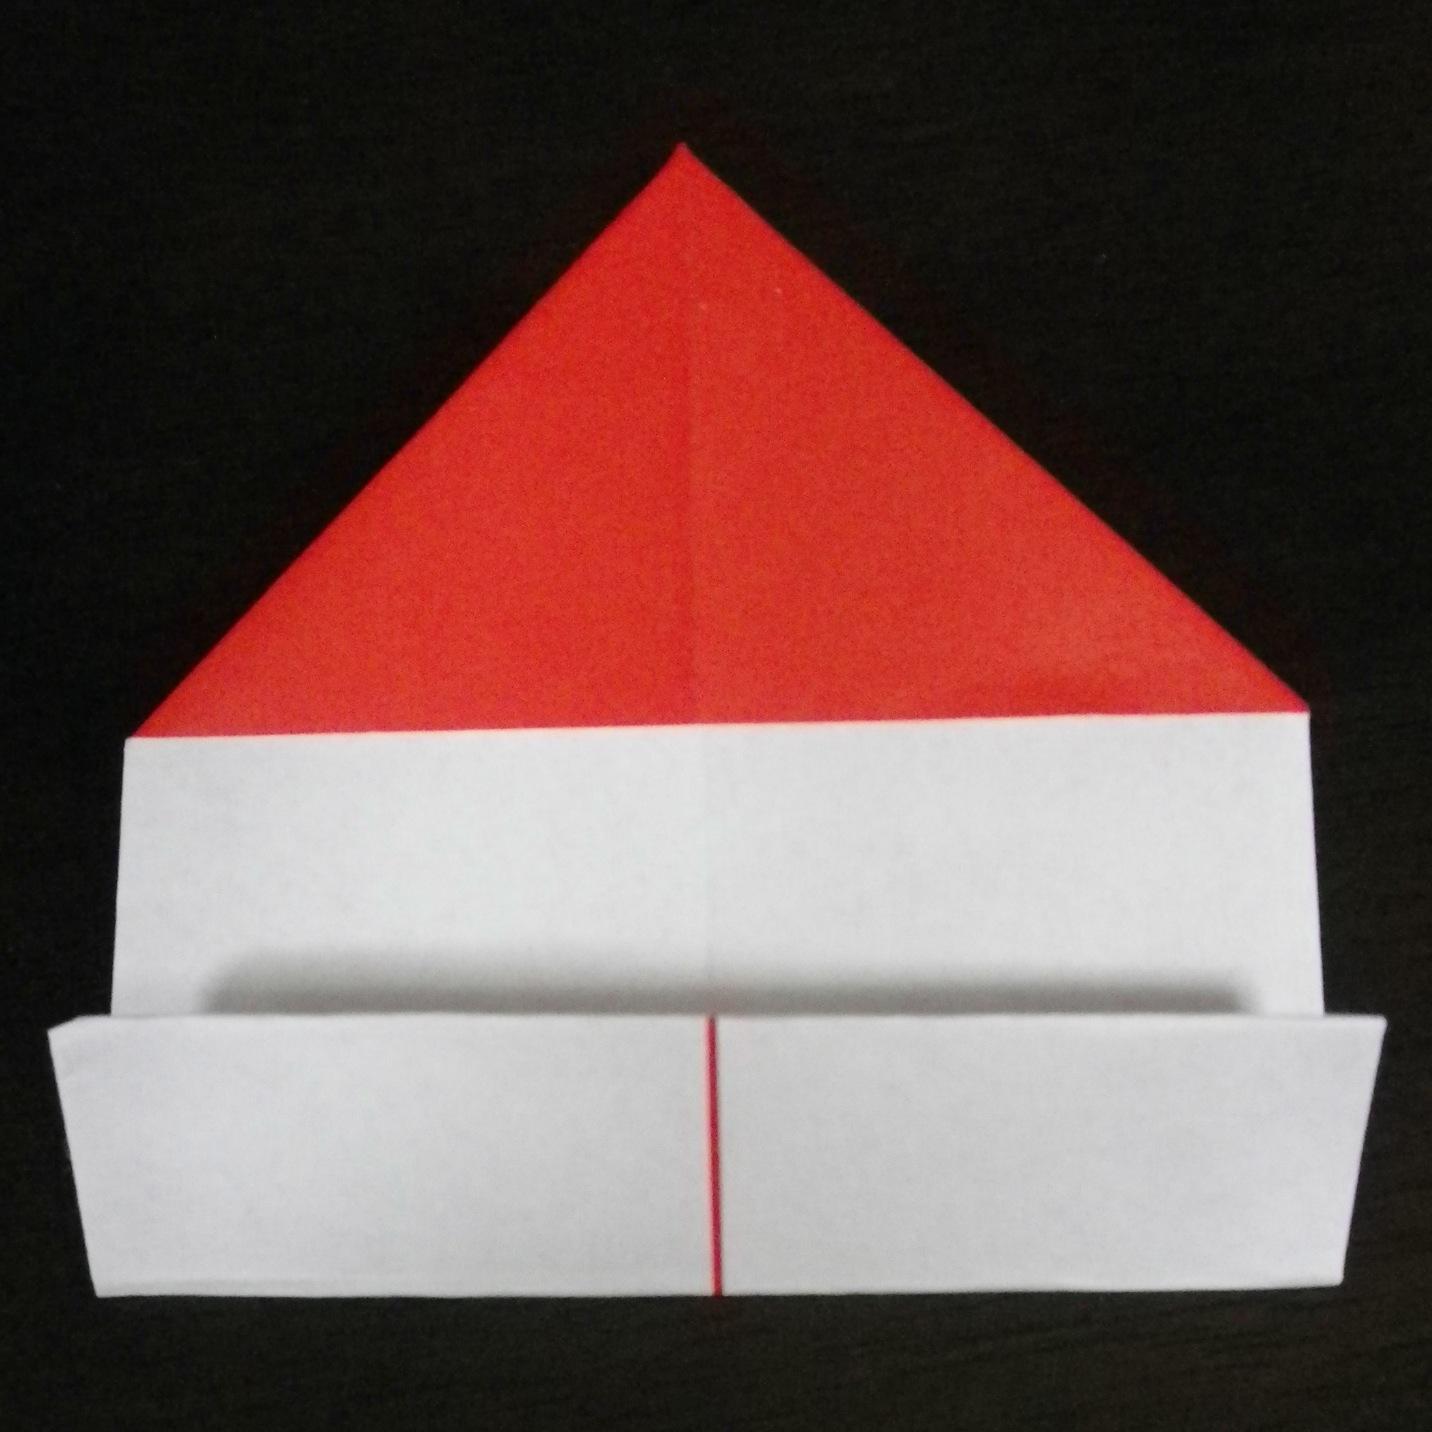 origami weihnachtsmann 8900km berlin. Black Bedroom Furniture Sets. Home Design Ideas